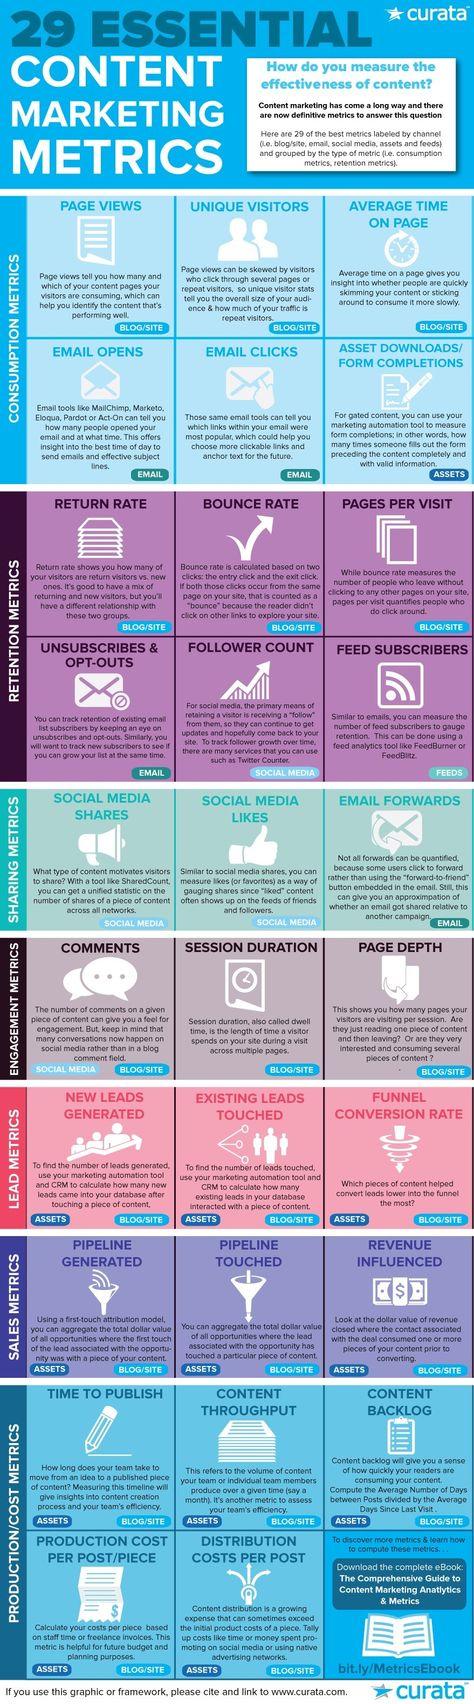 29 Essential Content Marketing Metrics [Infographic]